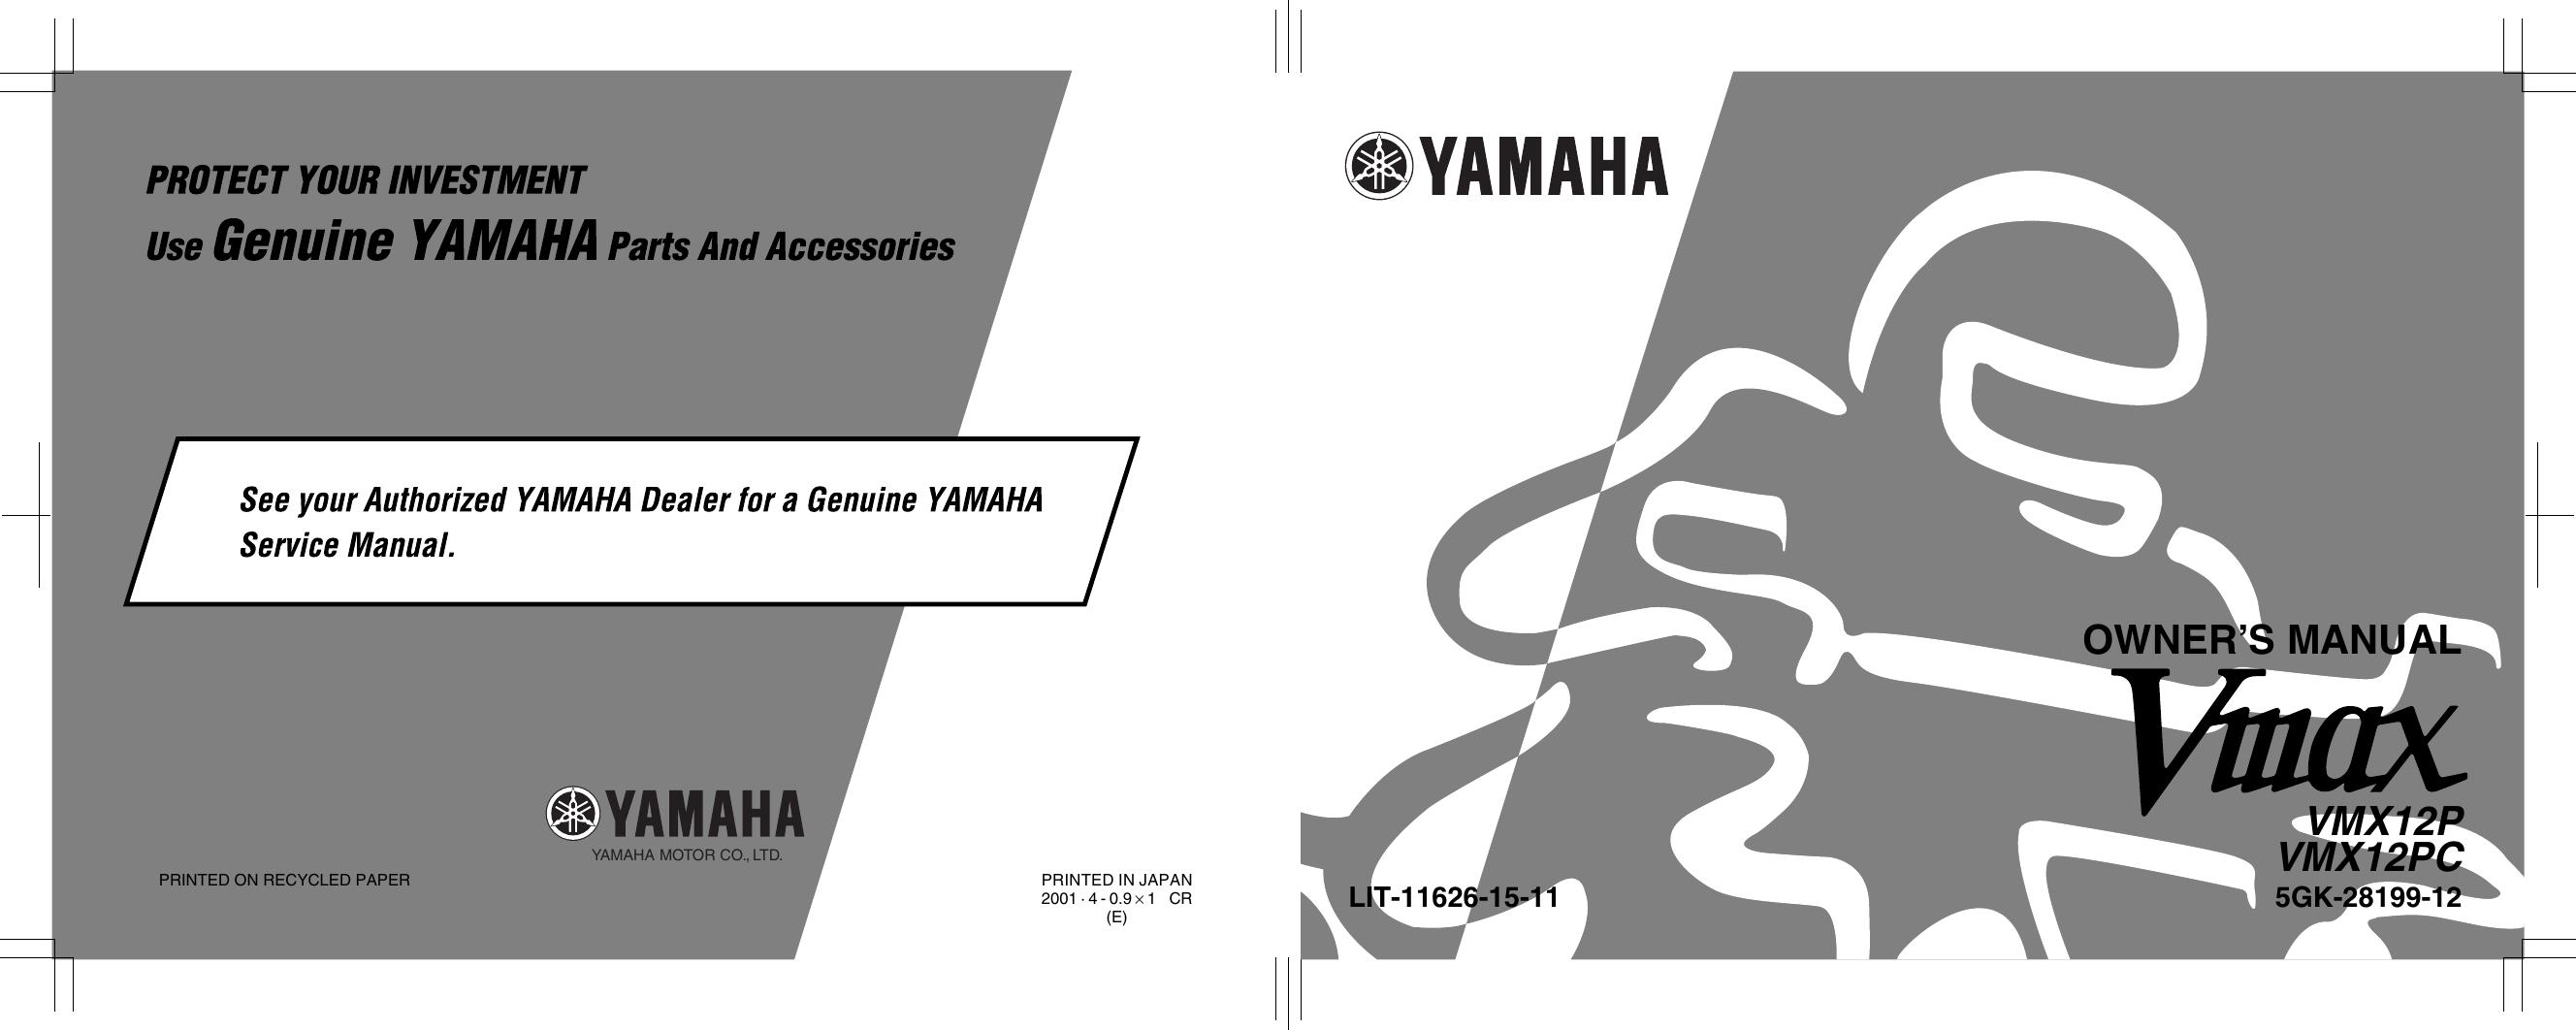 yamaha 2002 vmax owners manual v max rh usermanual wiki 2006 yamaha vmax owners manual vmax owners manual